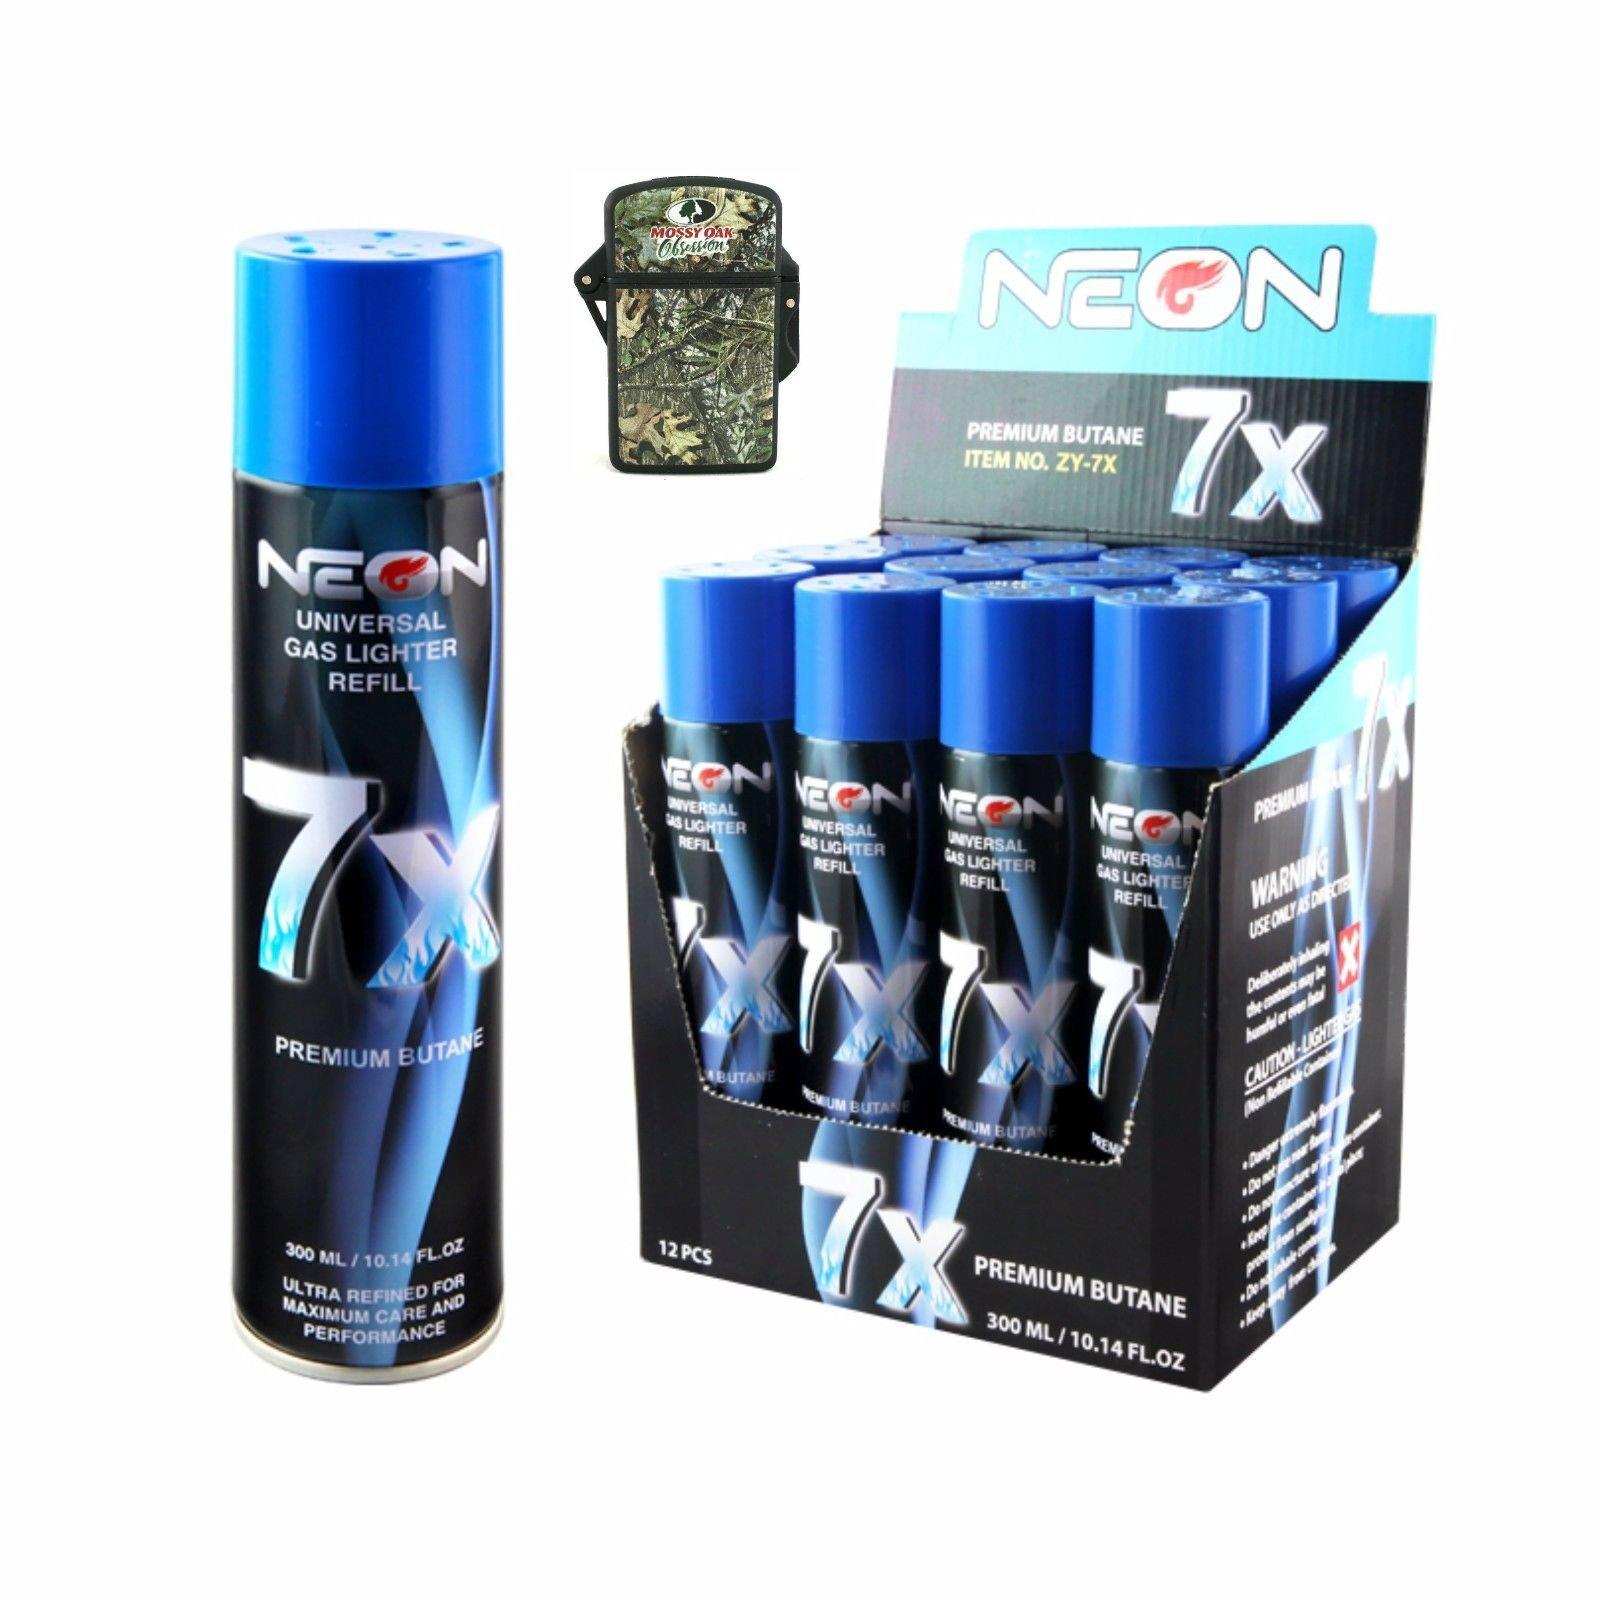 Neon 7x butane fuel+ torchLighter (12) (12)